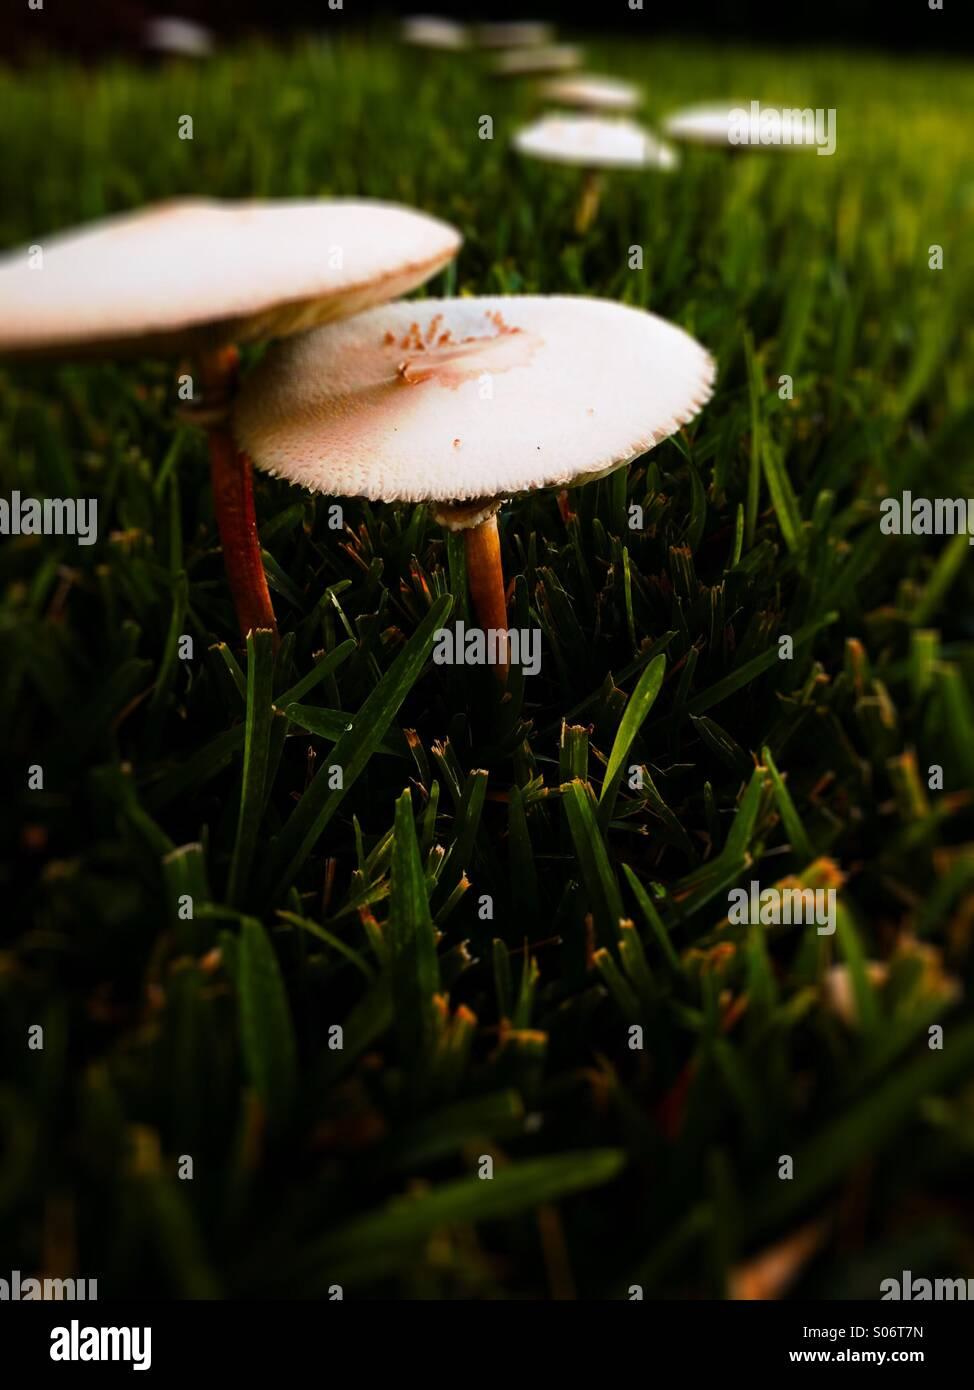 Mushrooms on lawn - Stock Image